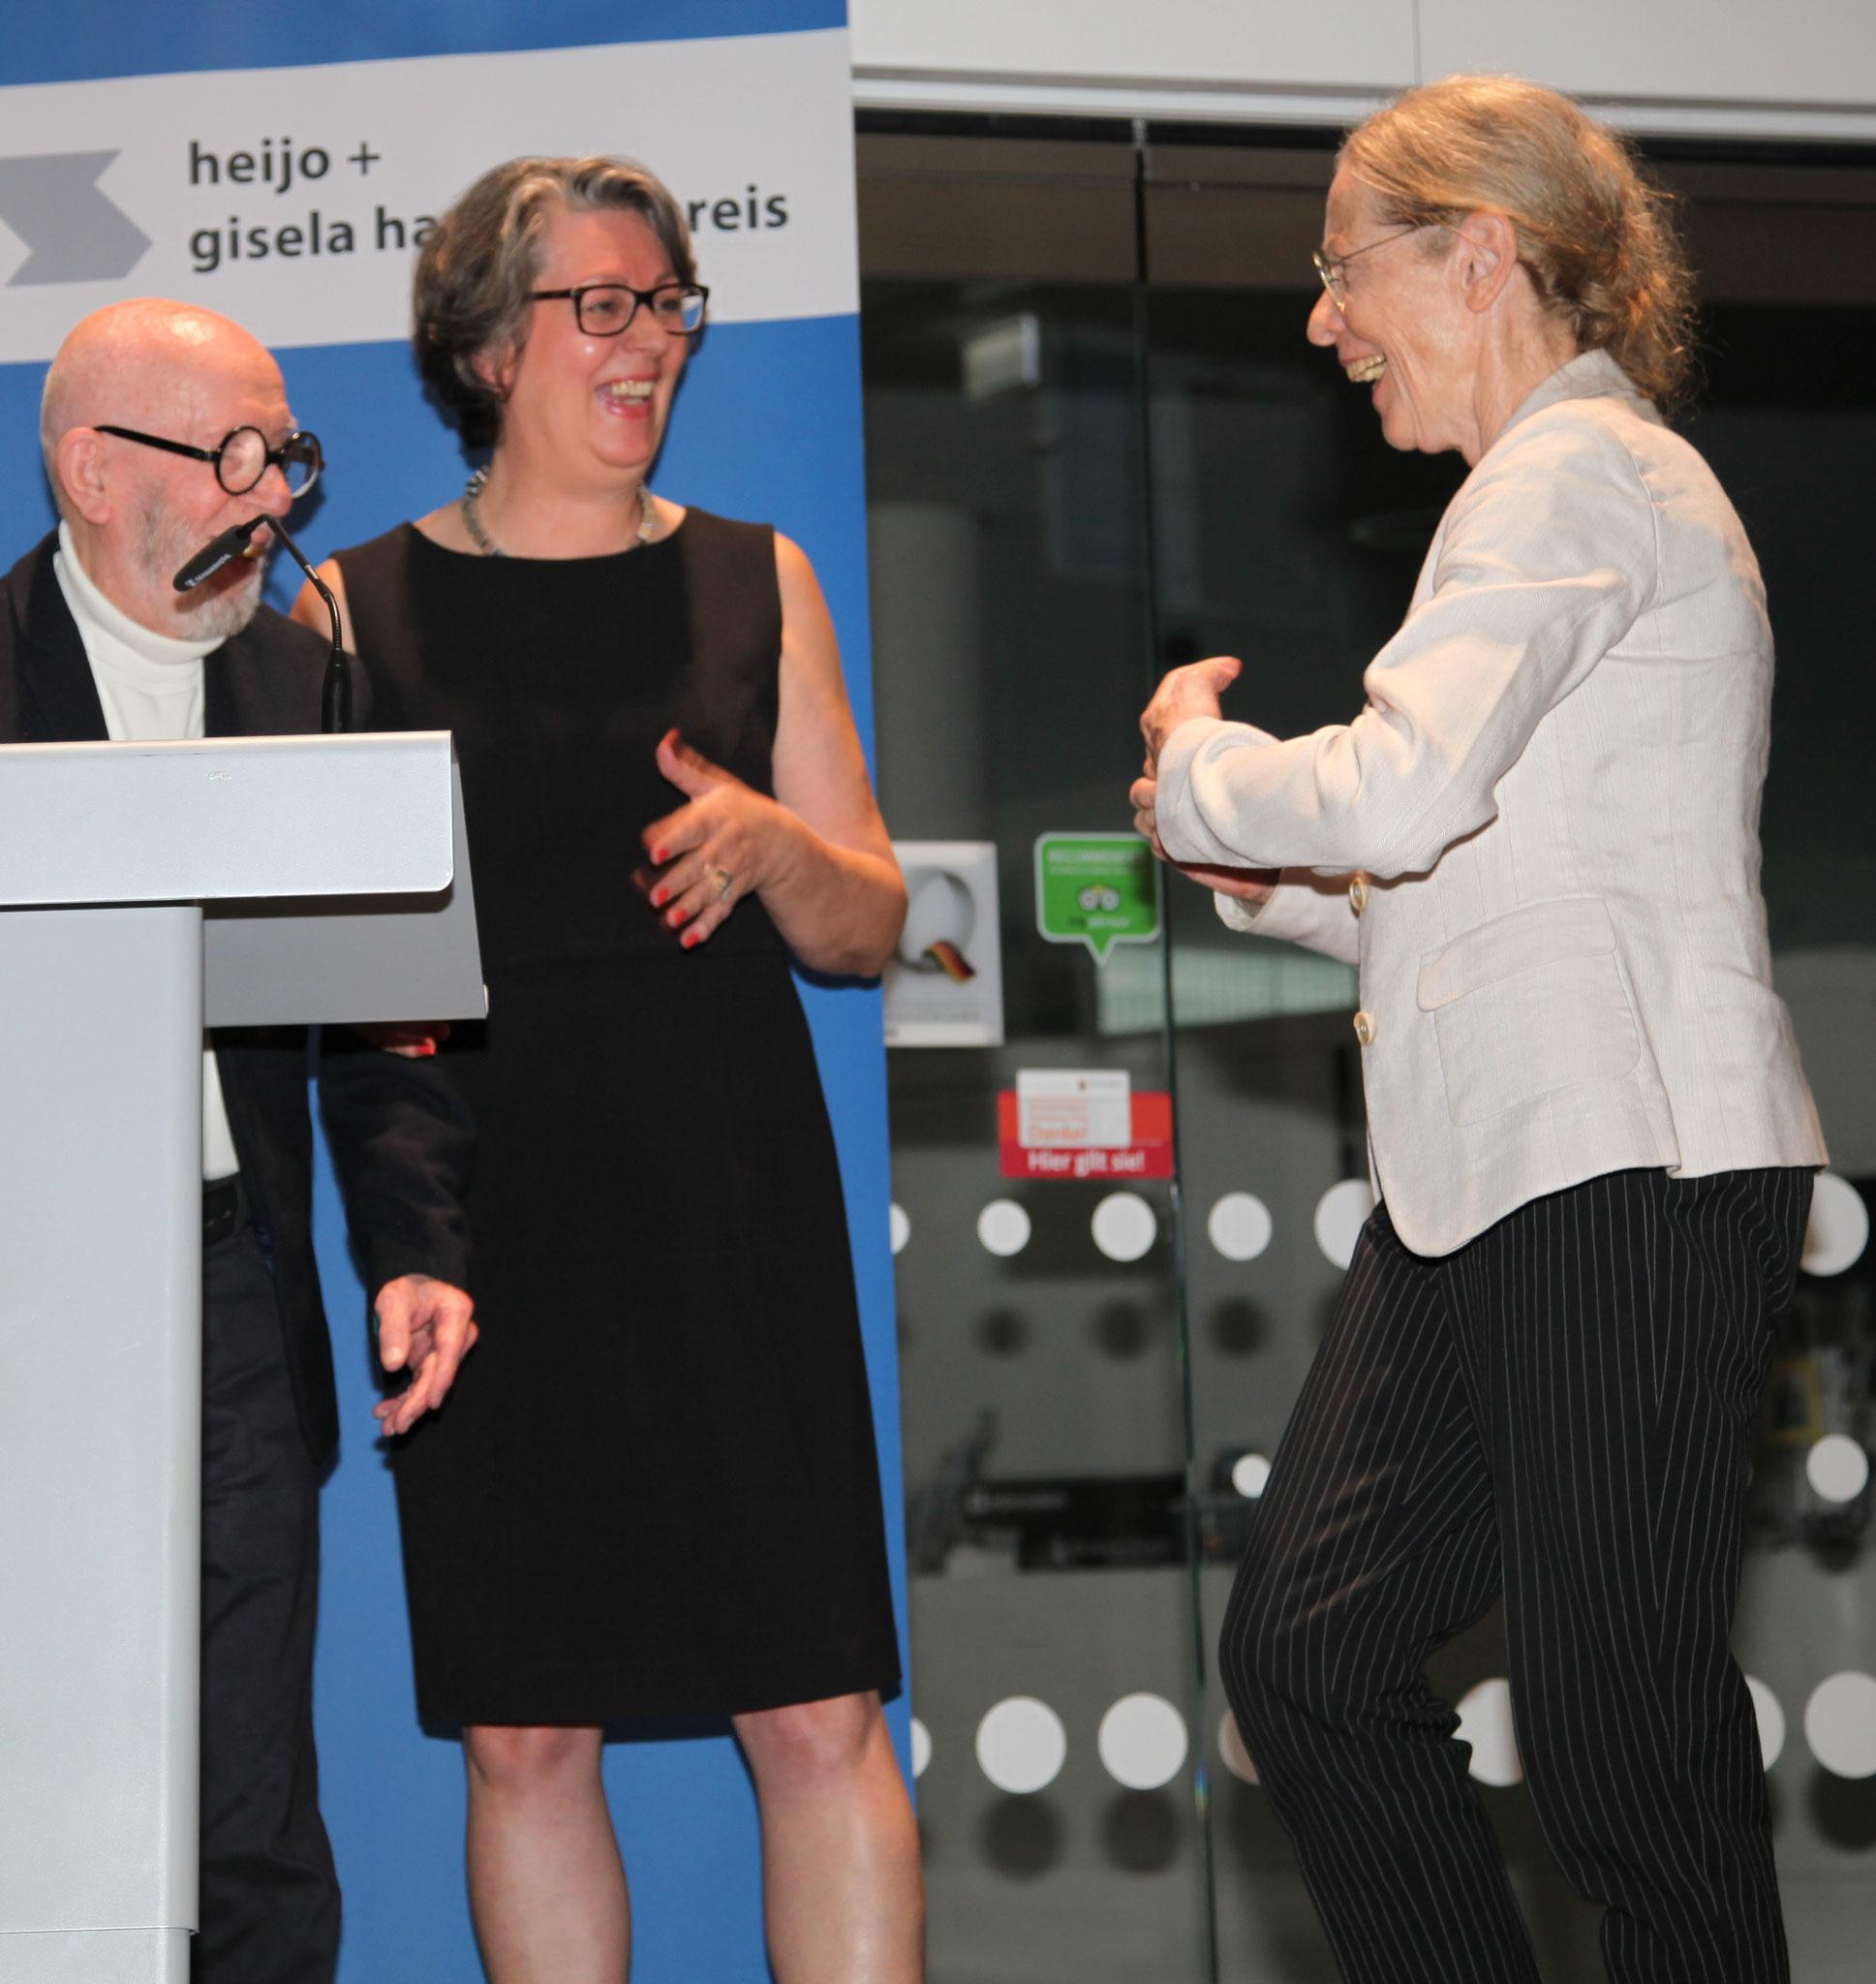 v. li.: heijo hangen, Claudia Blum-Frerichs, Susanne Linke